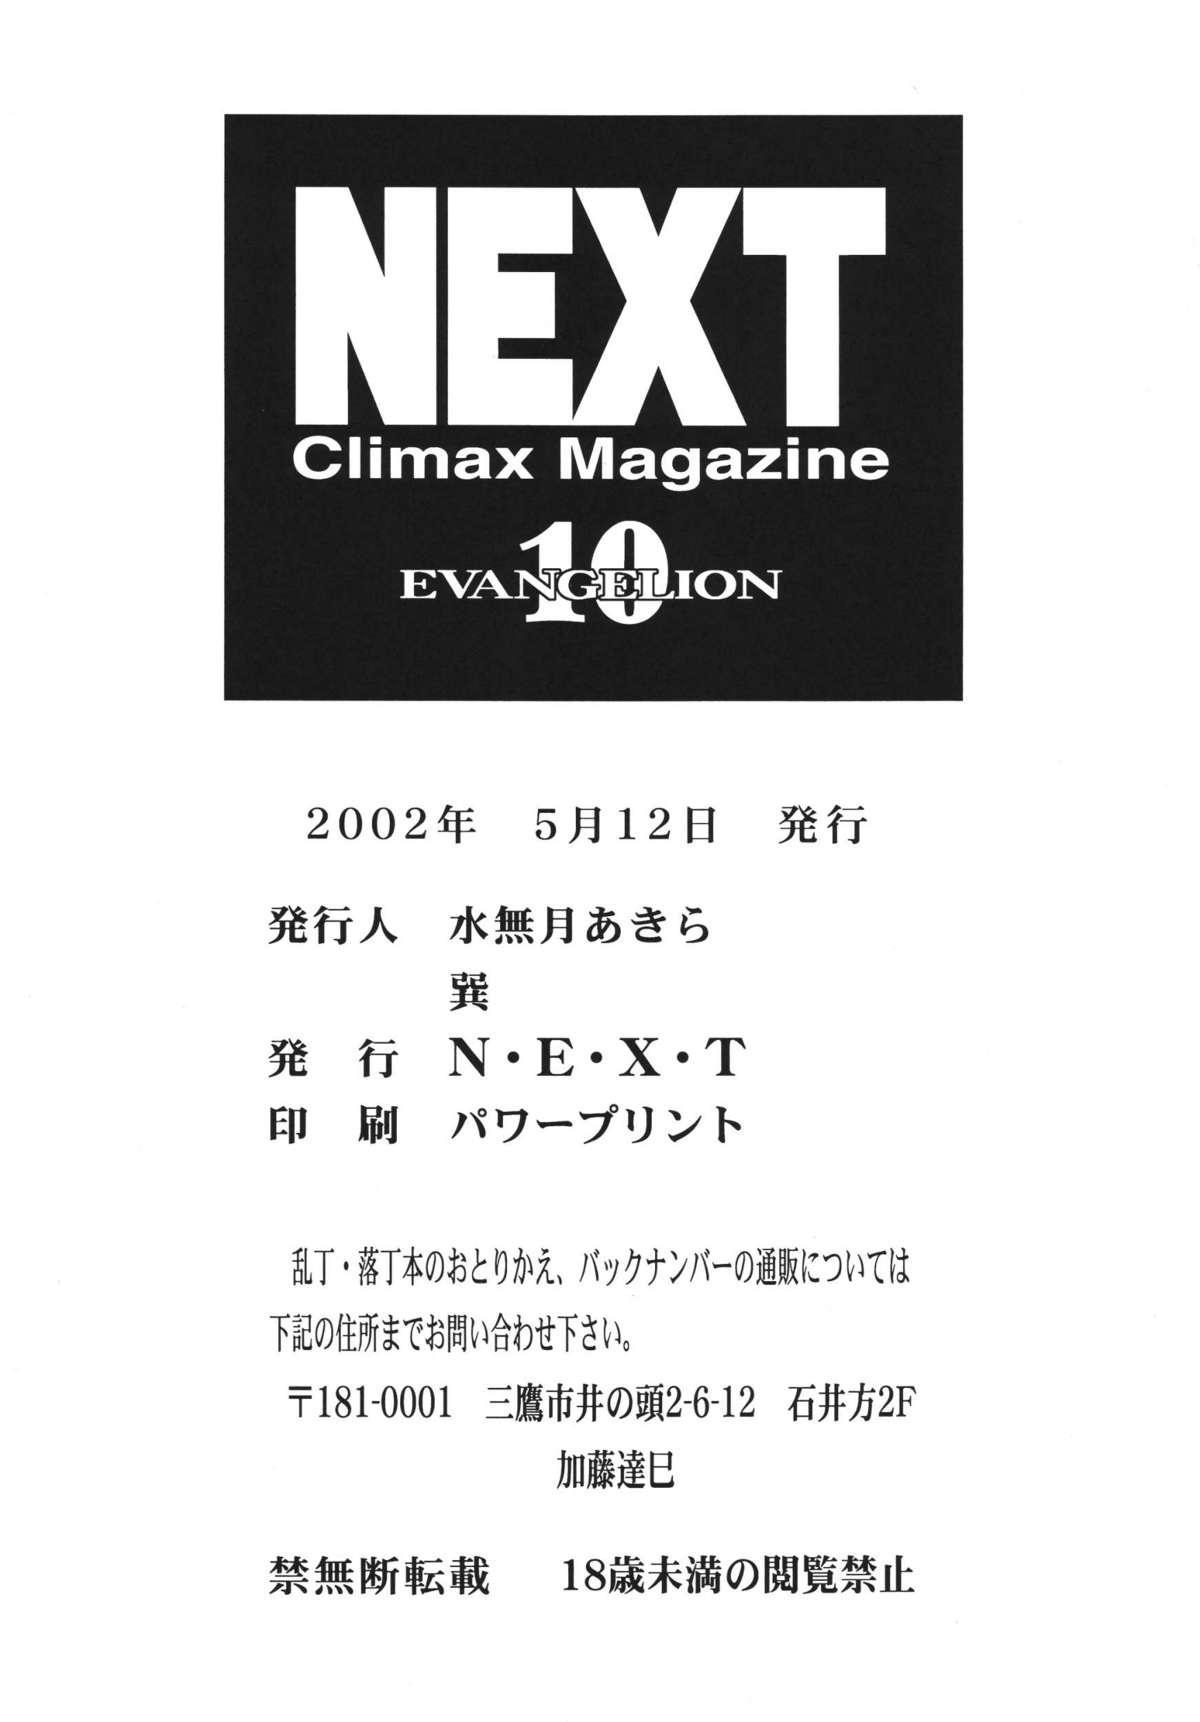 NEXT Climax Magazine 10 101